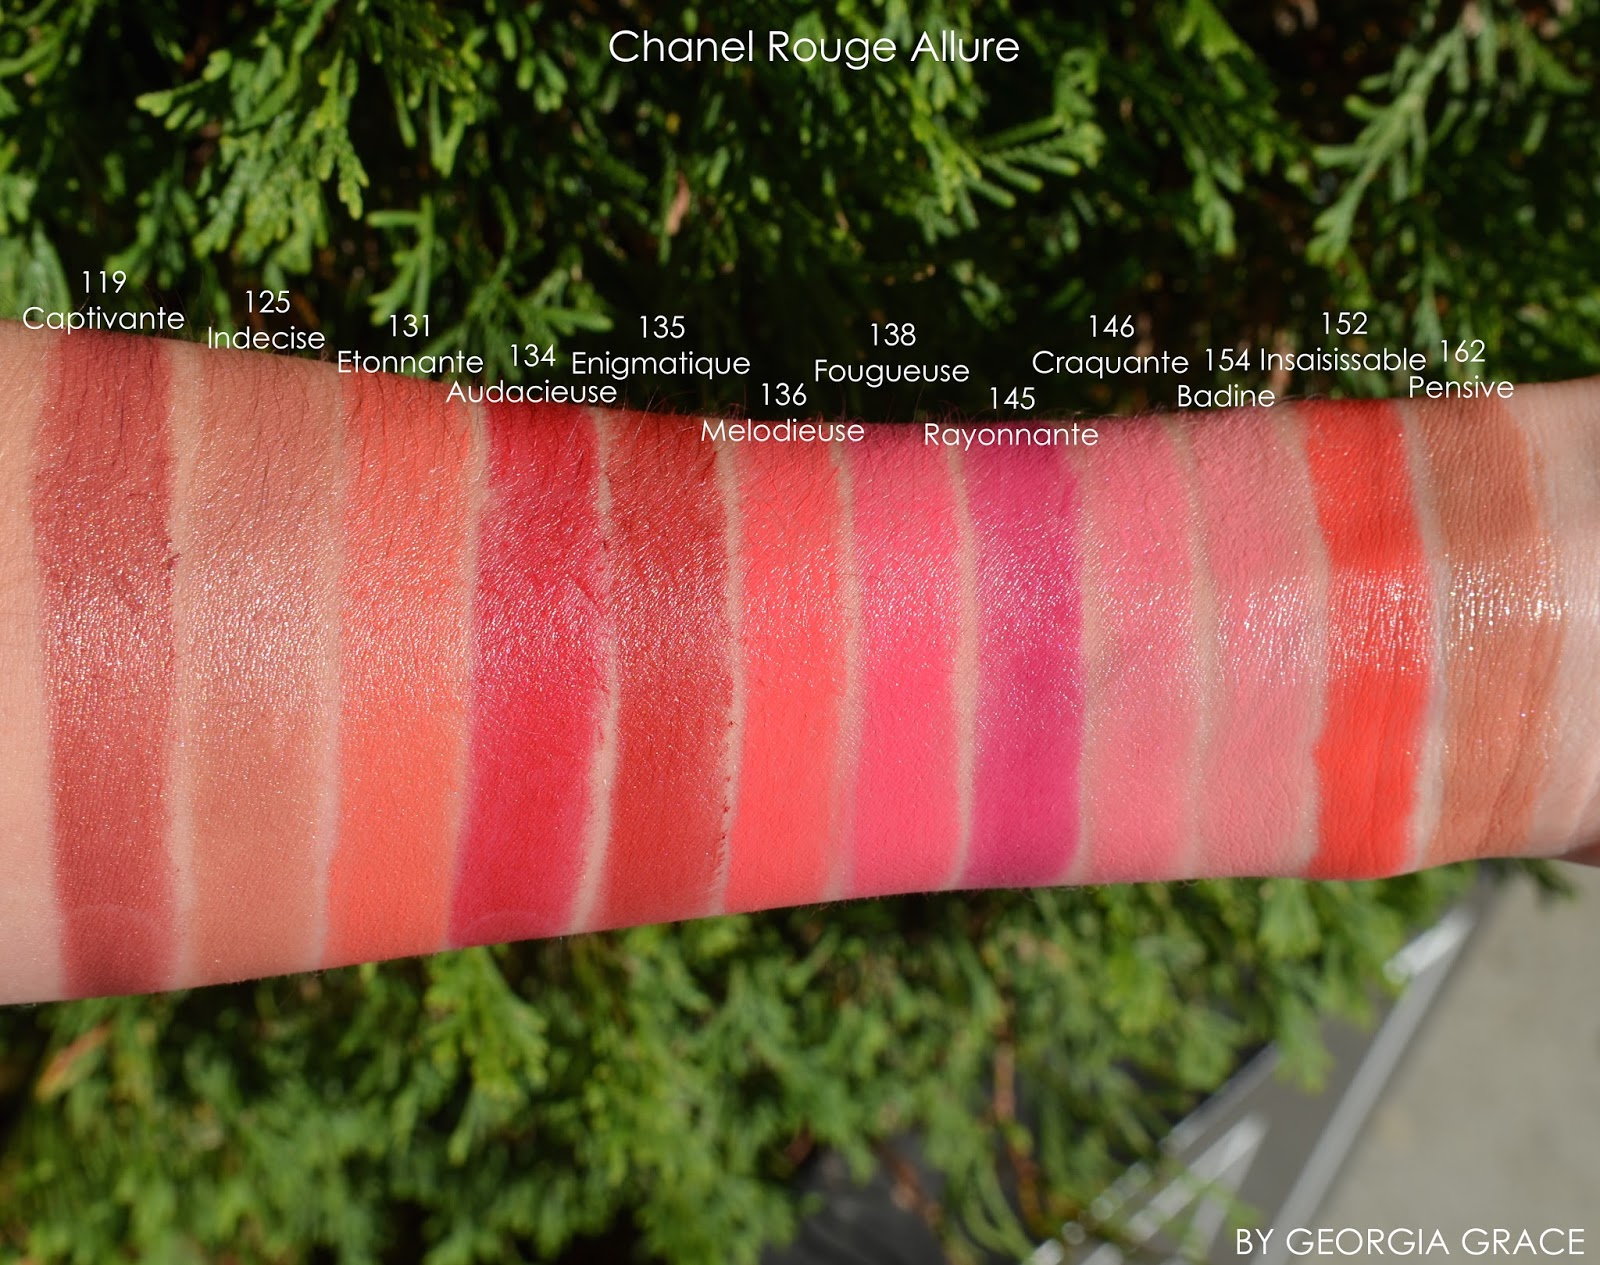 Chanel Velvet Lipstick Swatches